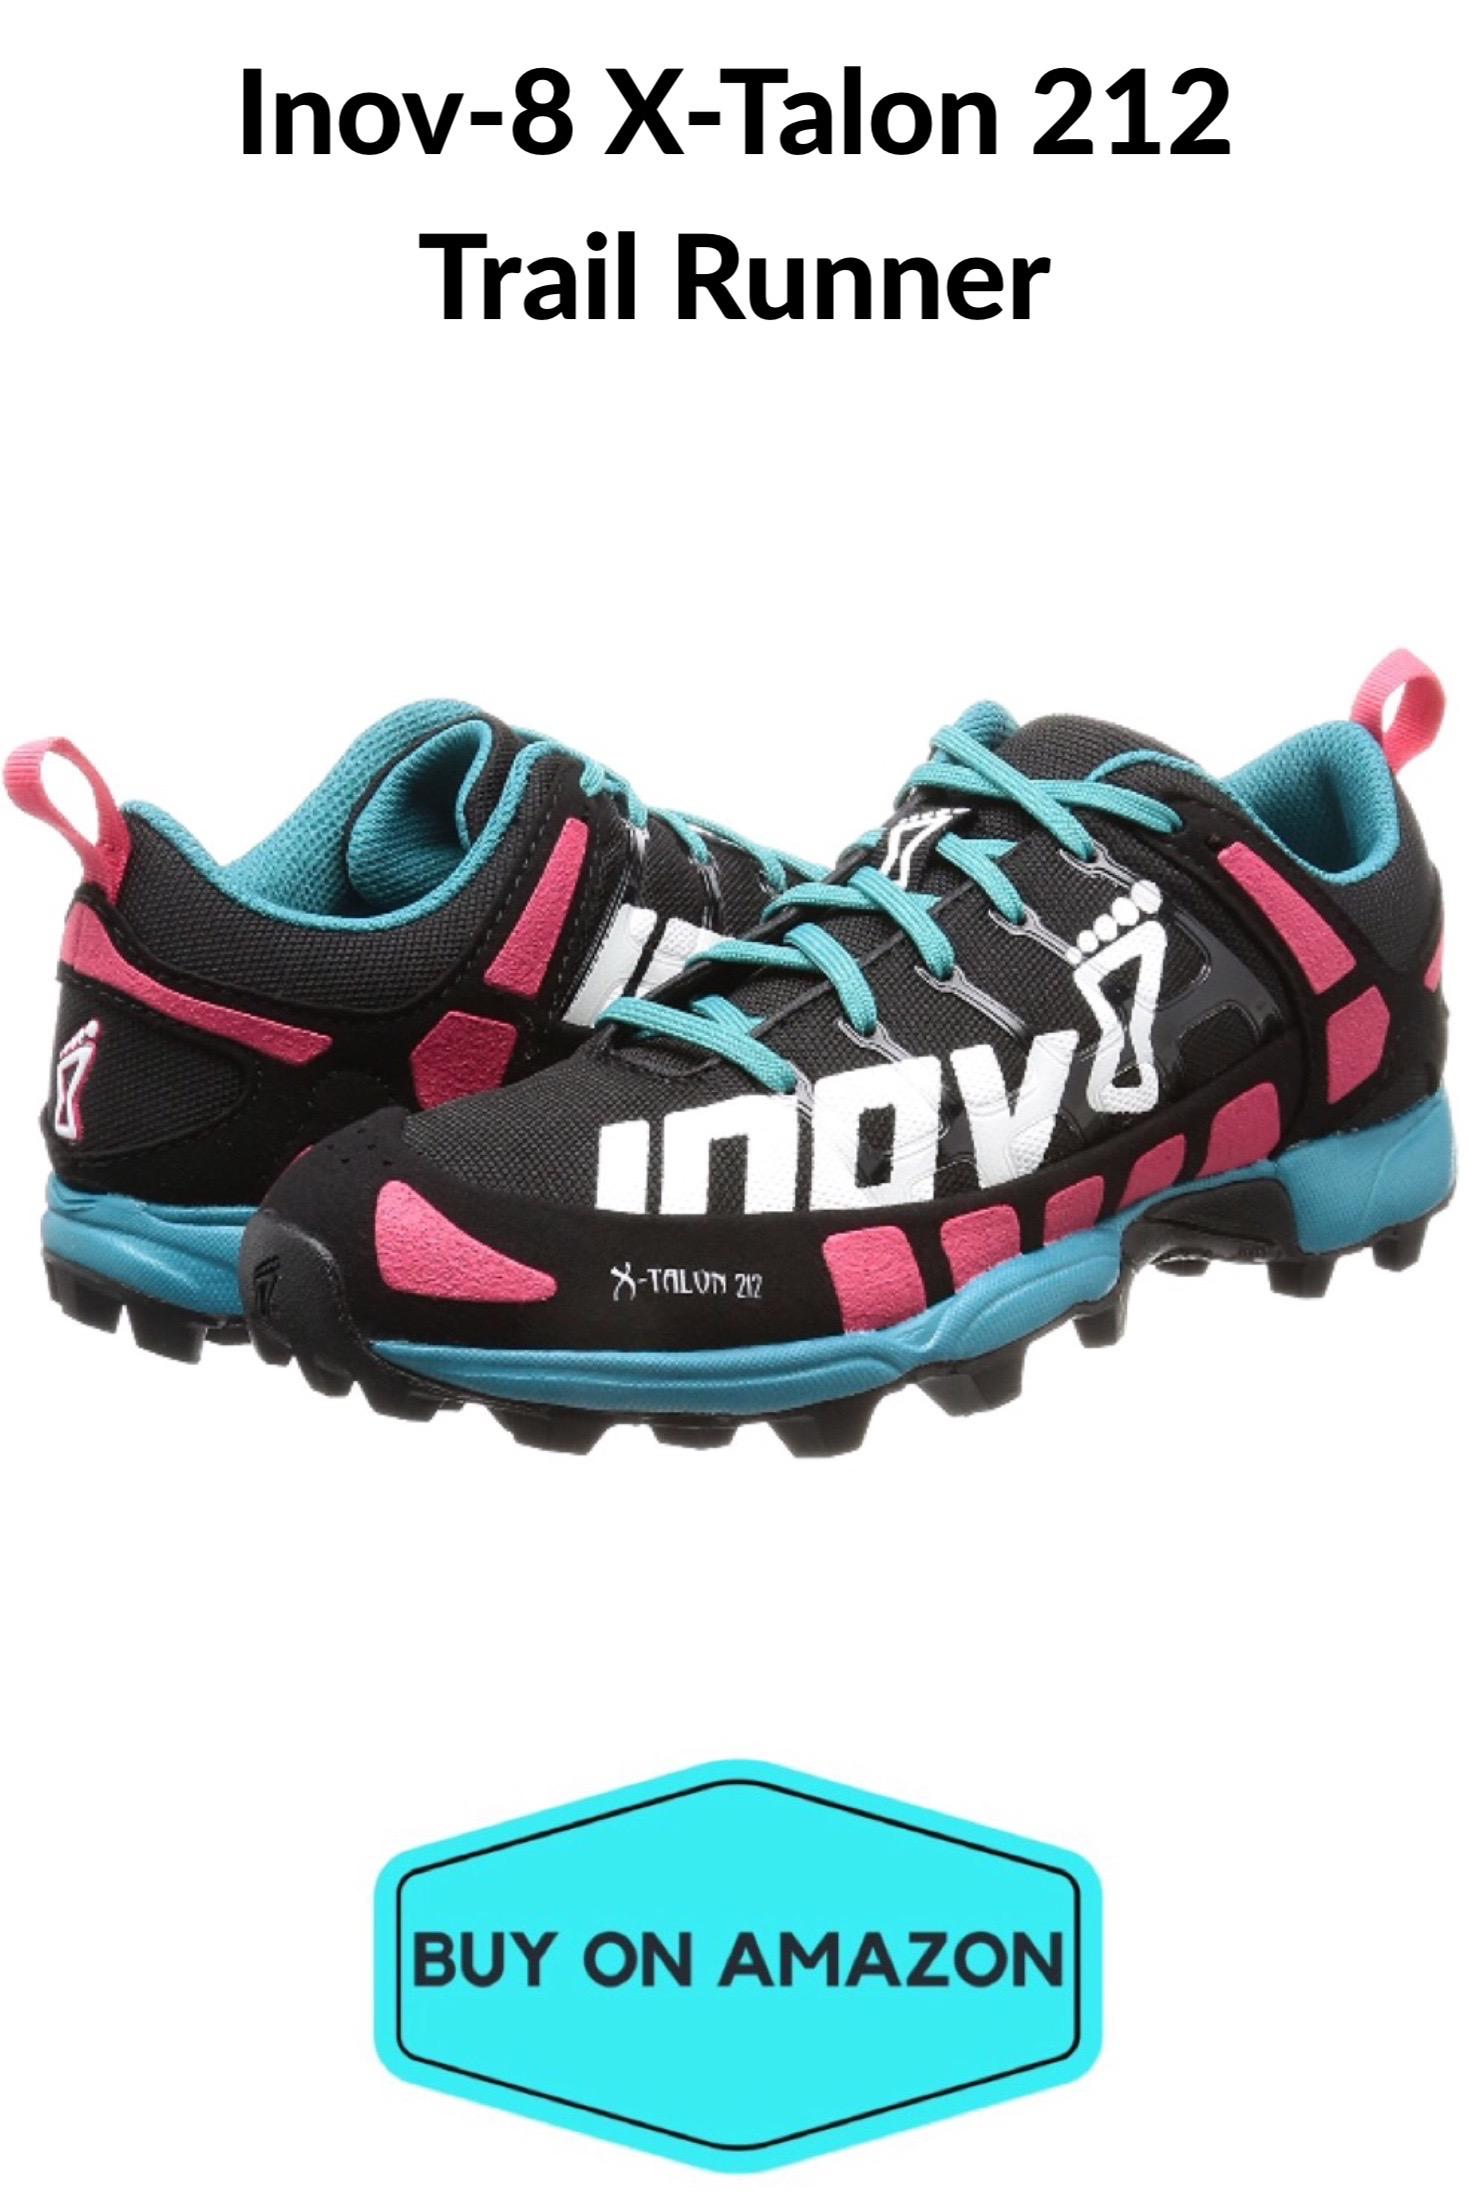 Inov-8 X-Talon 212 Women's Trail Runner